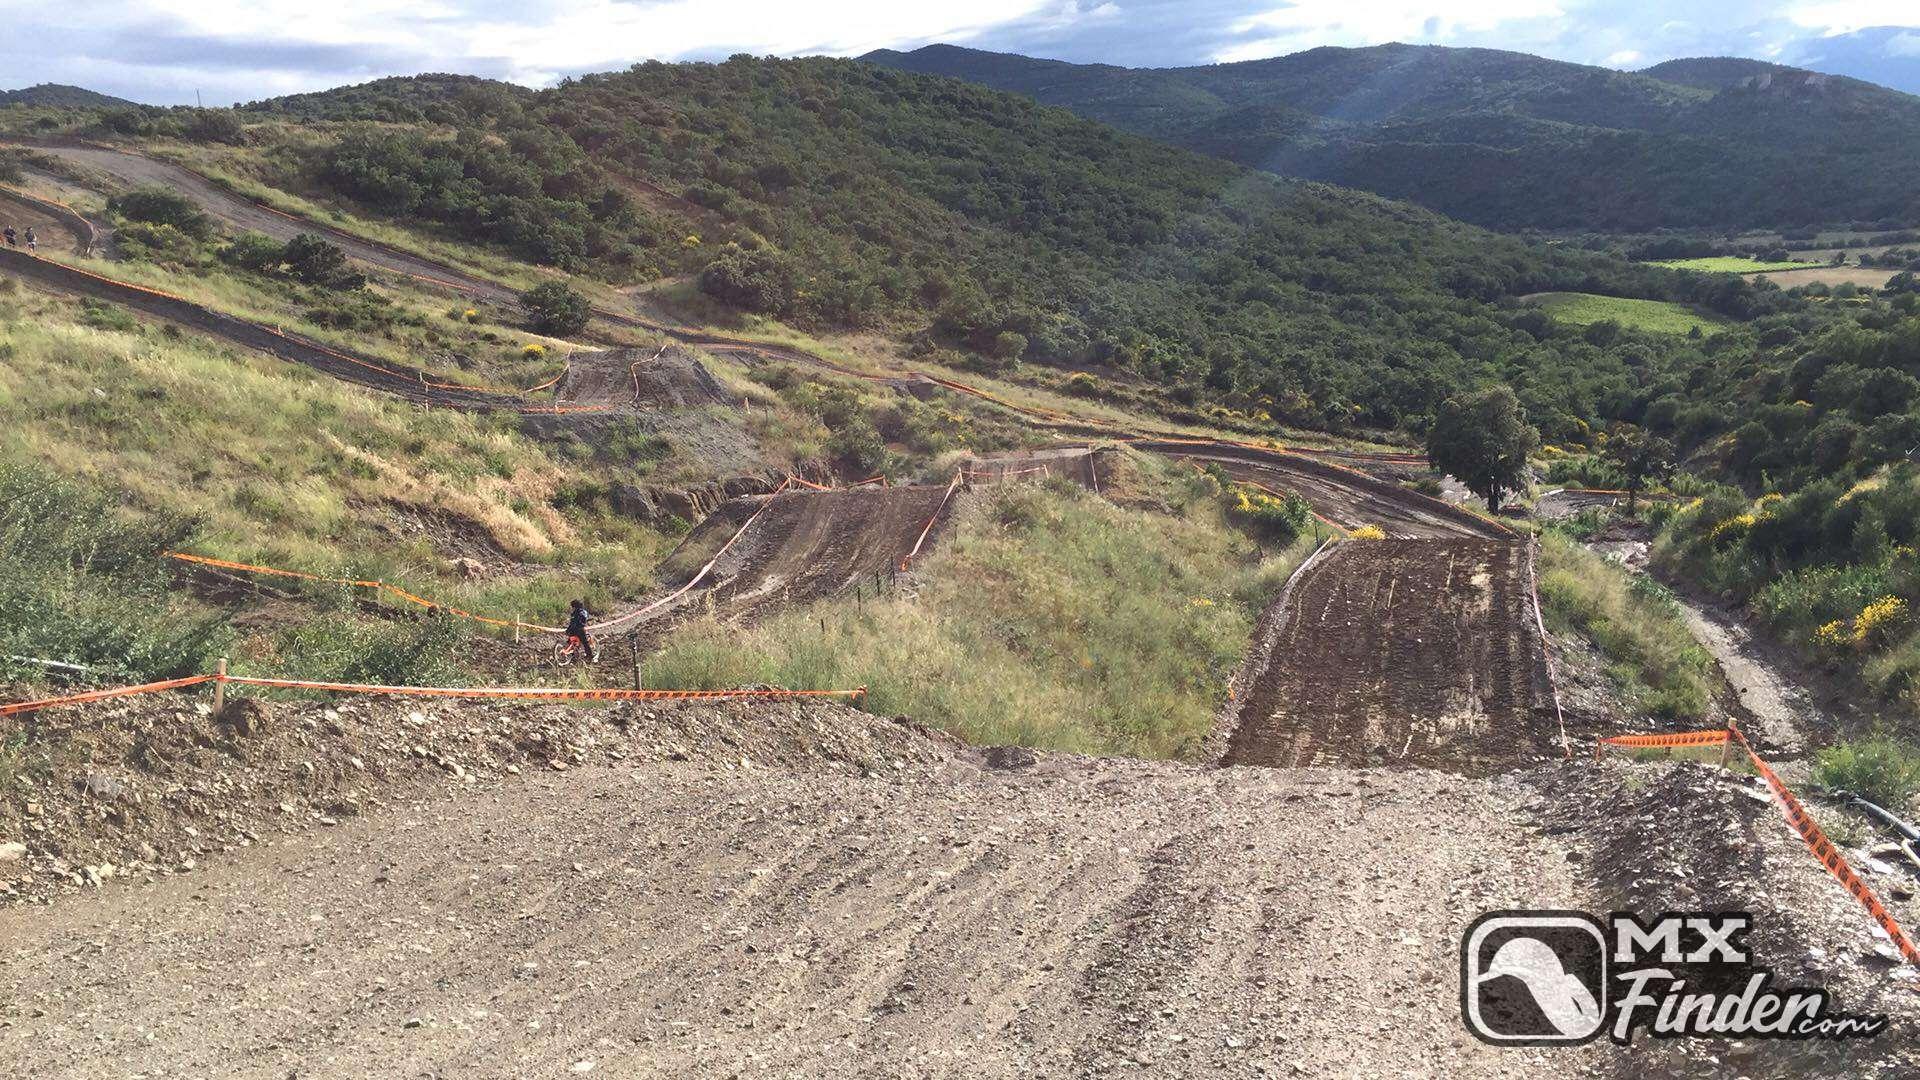 motocross, ASM Corberè Motocross, Corberè les Cabanes, motocross track